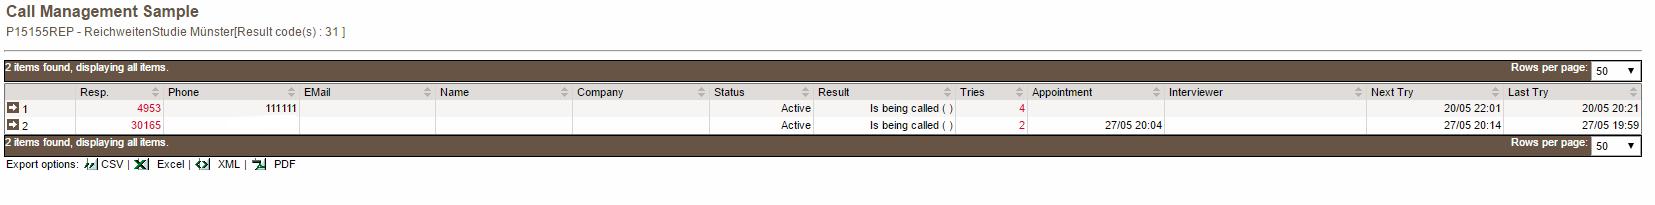 Call Management Sample